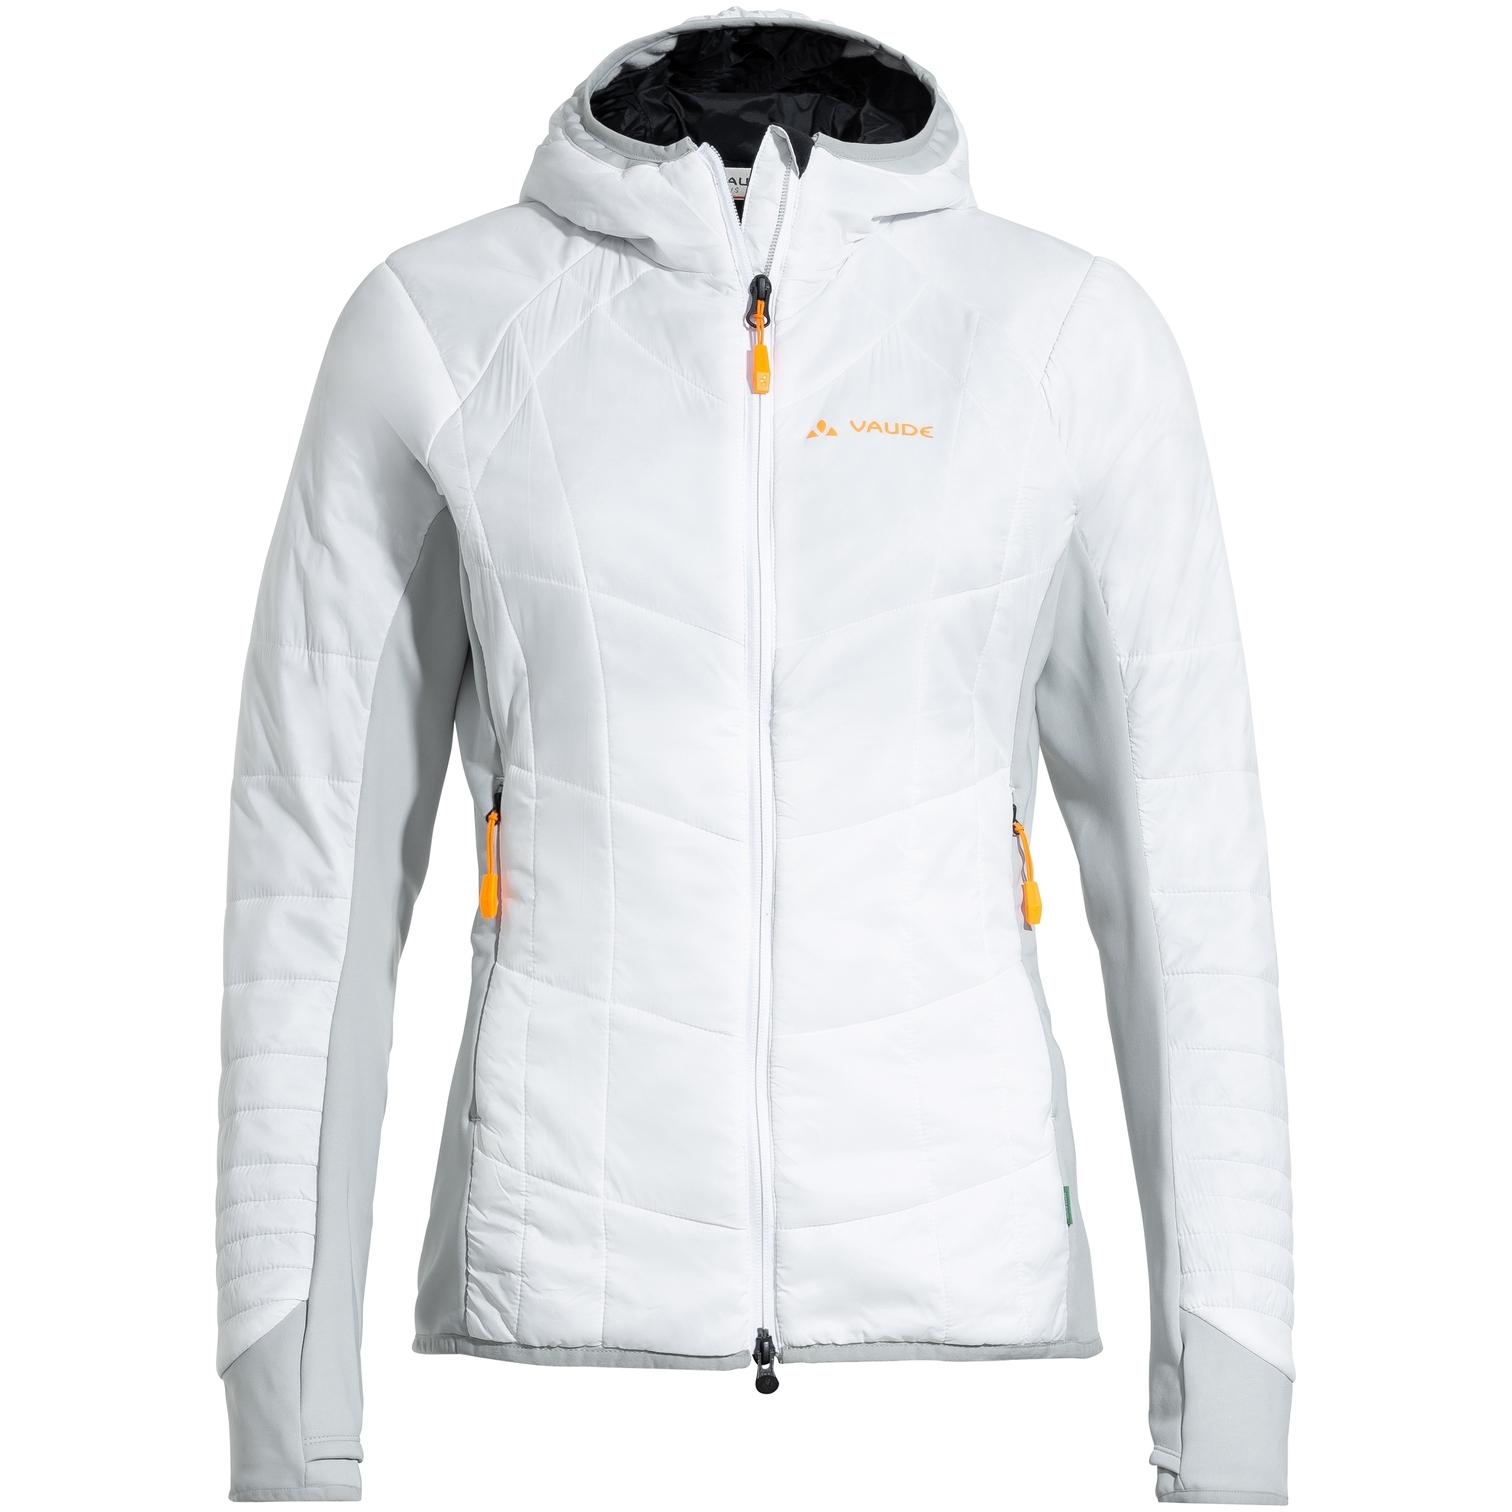 Image of Vaude Women's Sesvenna Jacket III - white/grey